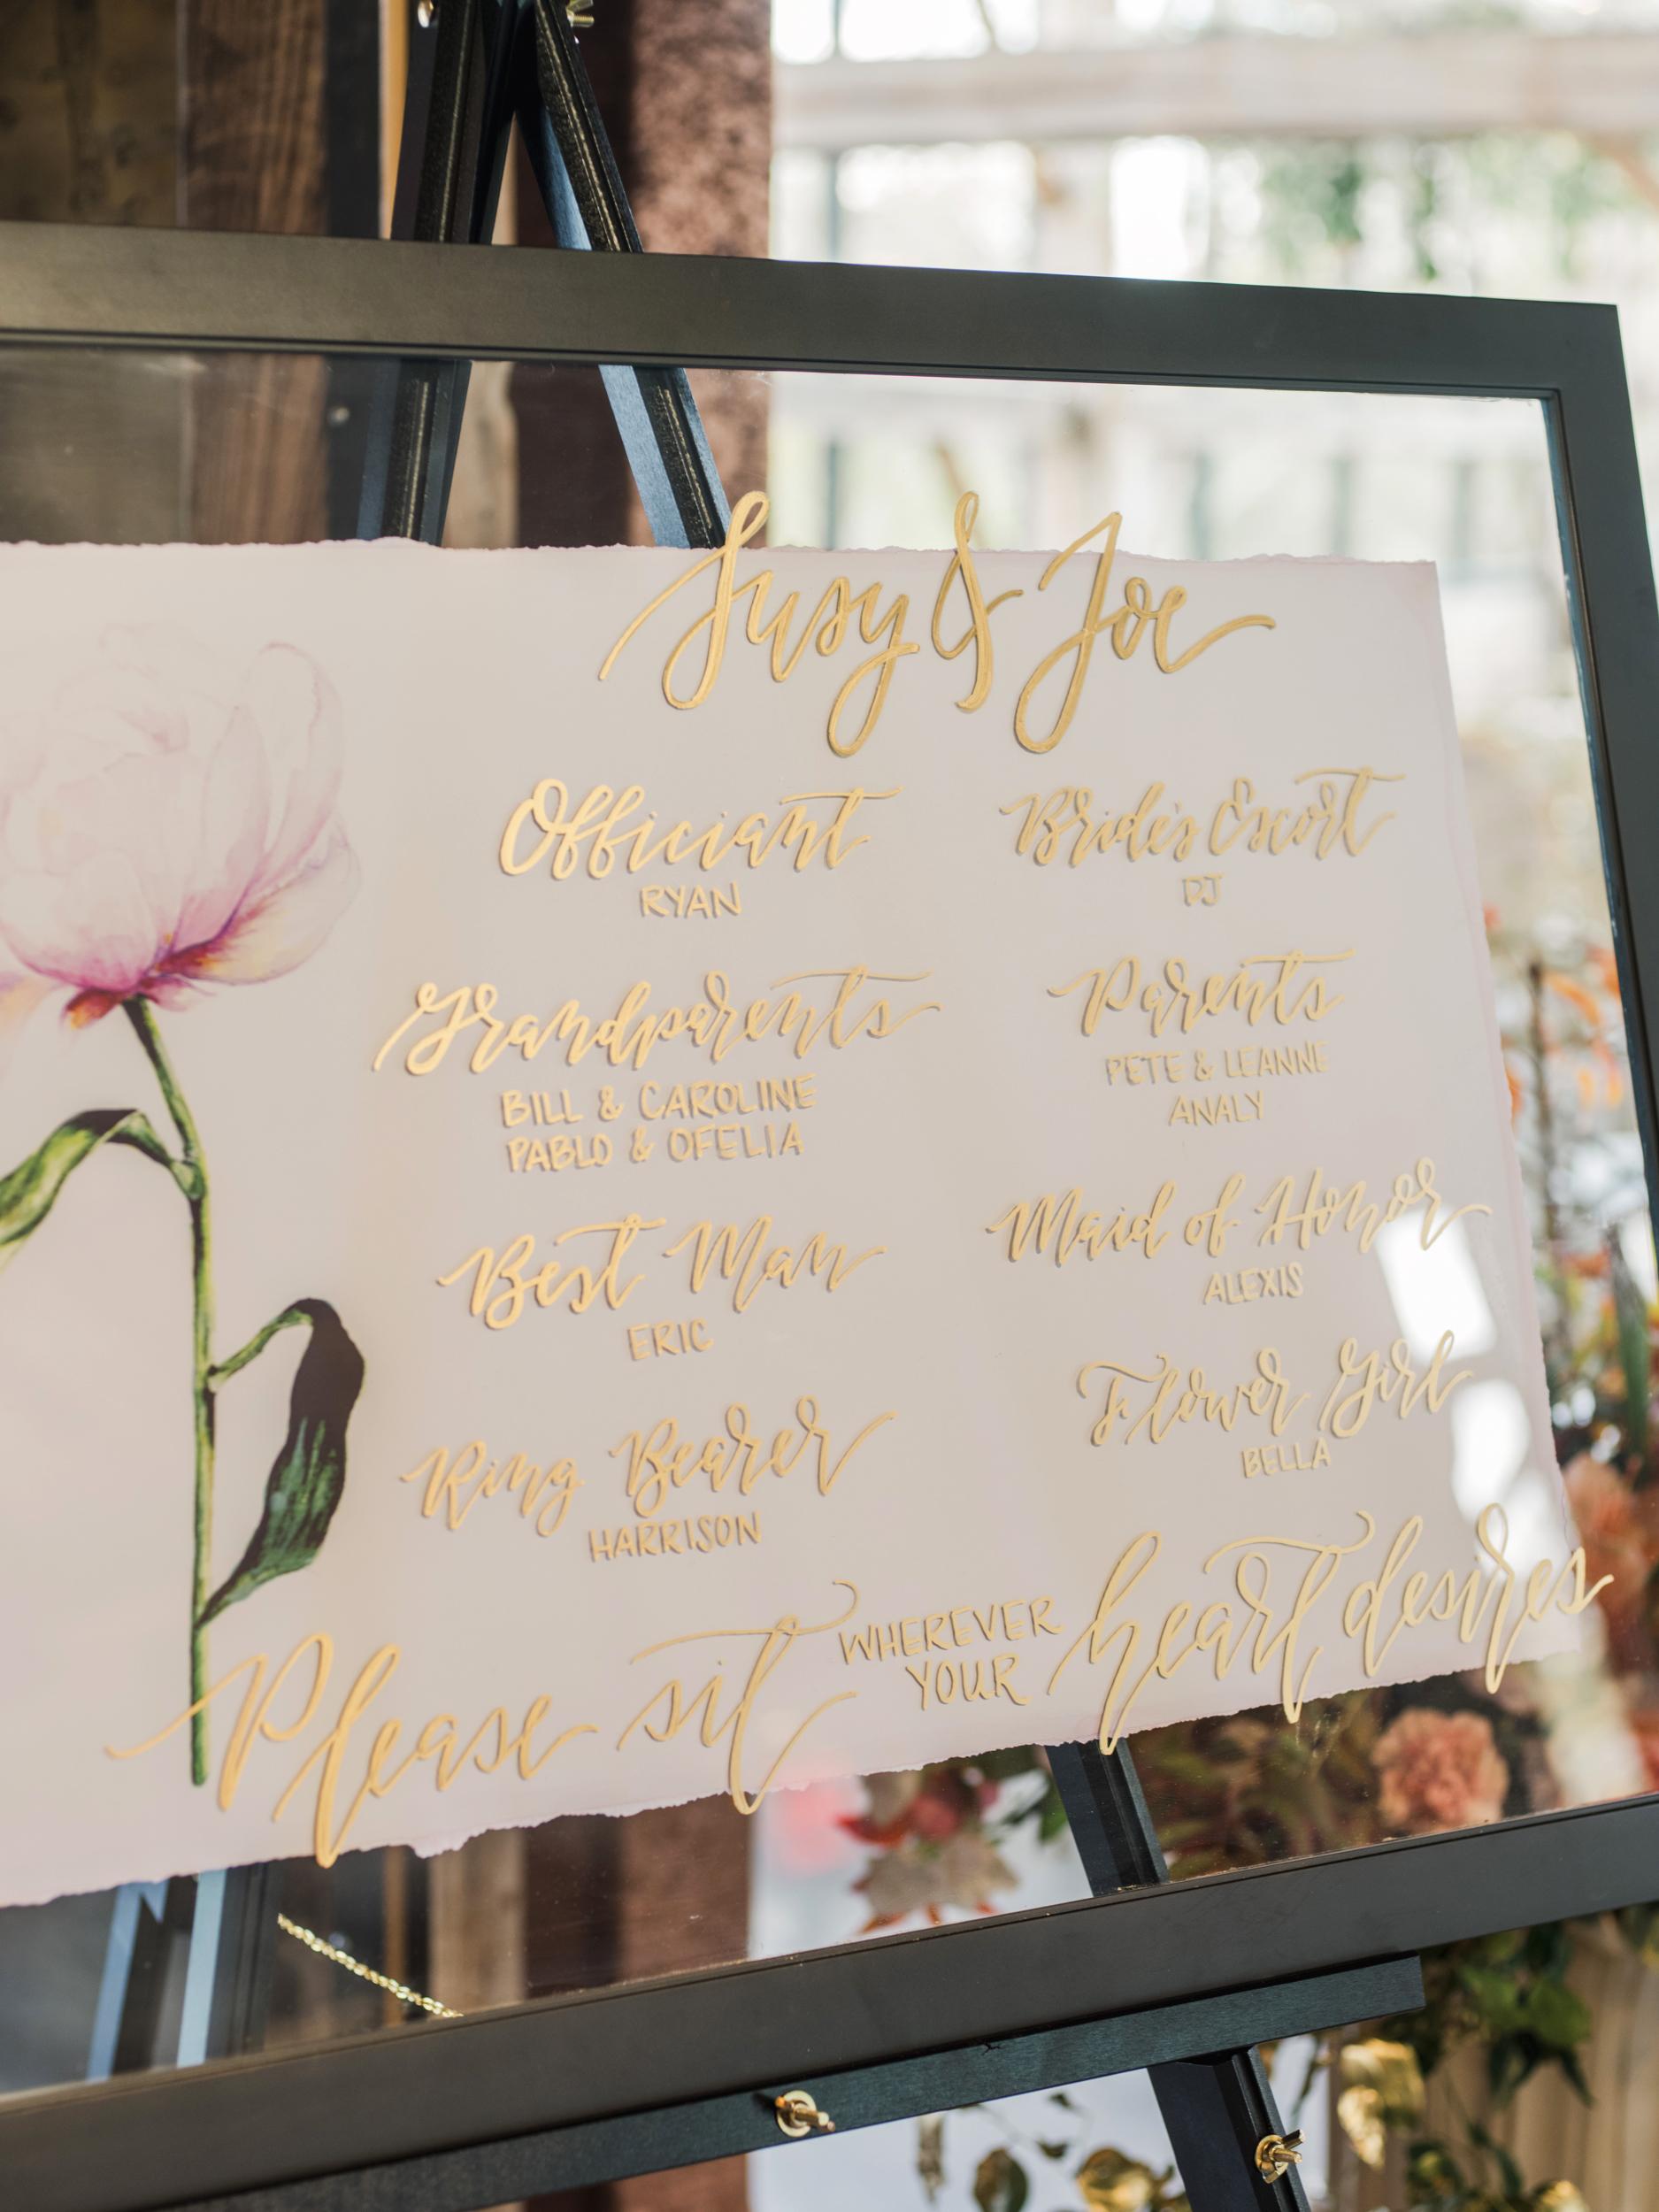 suzanne joseph wedding signage program corbin gurkin